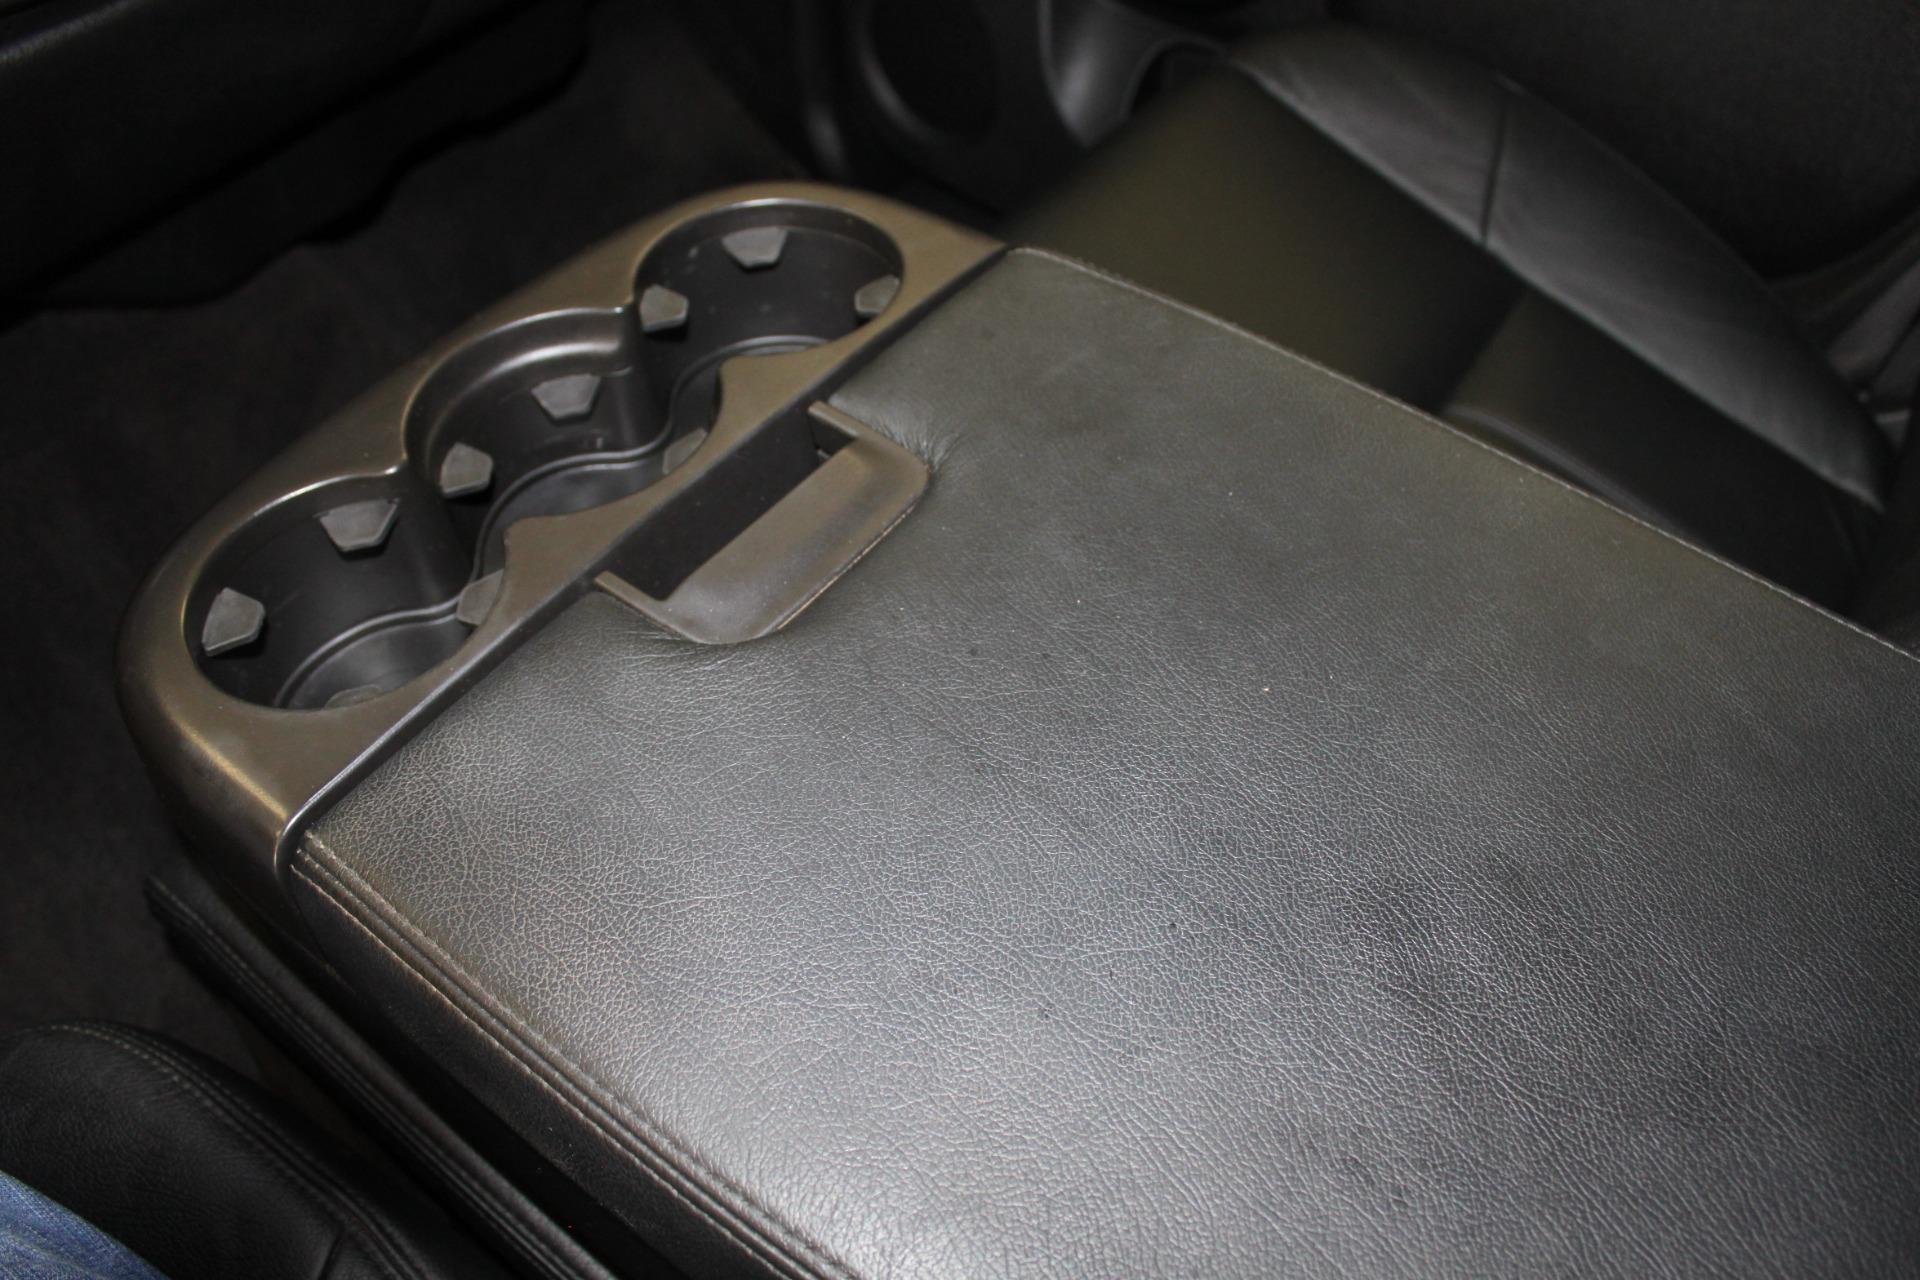 Used-2013-GMC-Sierra-1500-SLE-Z71-4X4-Camaro